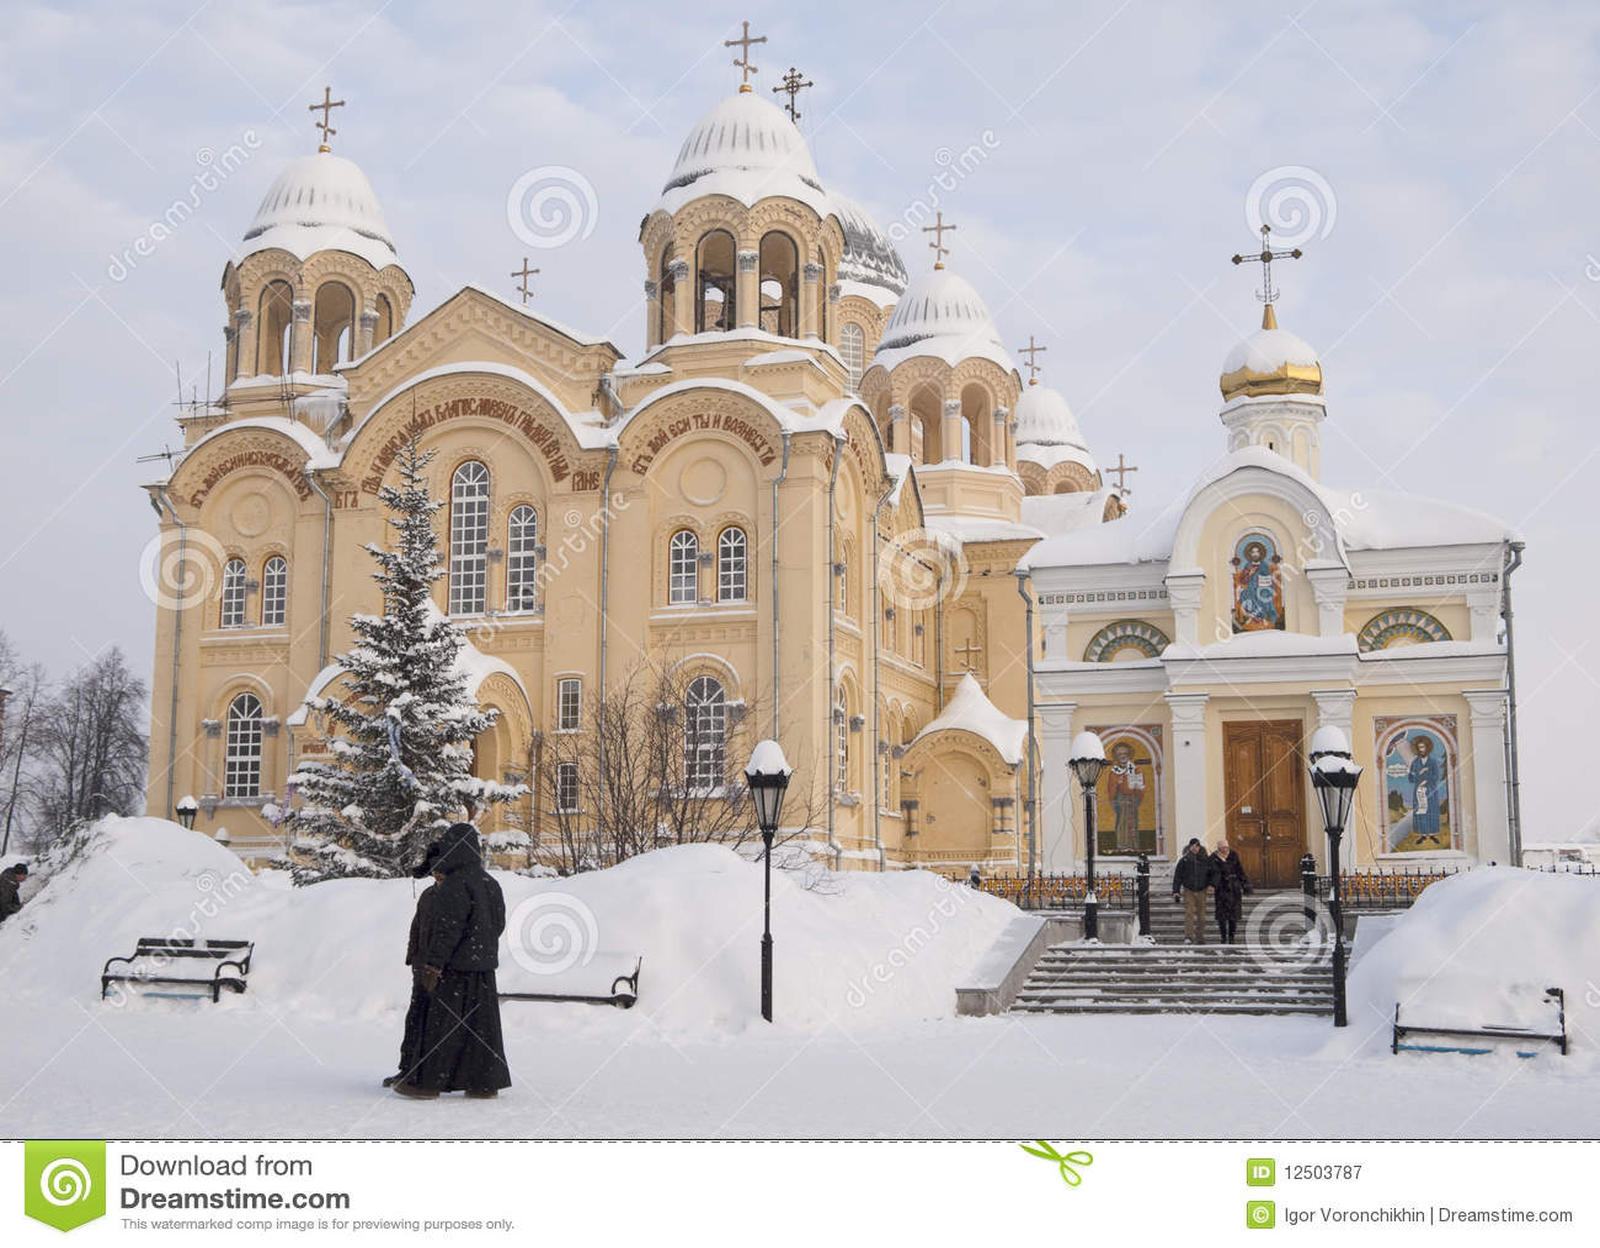 Nikolaev city, Ukraine (Mykolaiv)